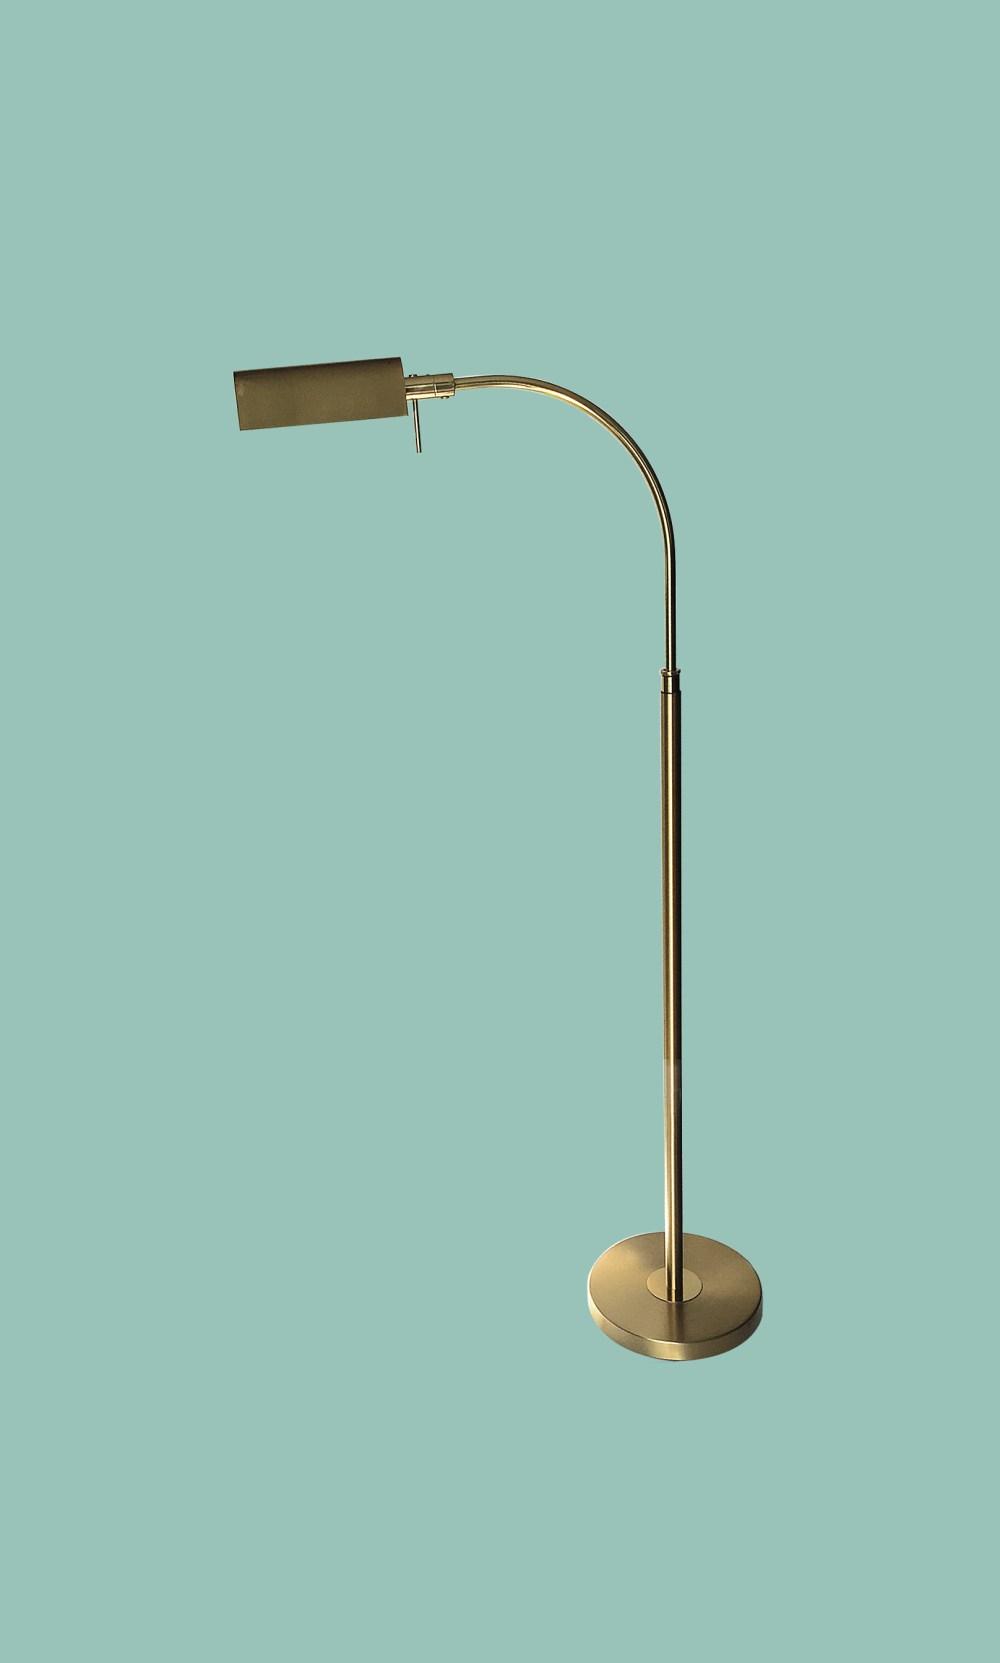 lampadaire scandinave laiton